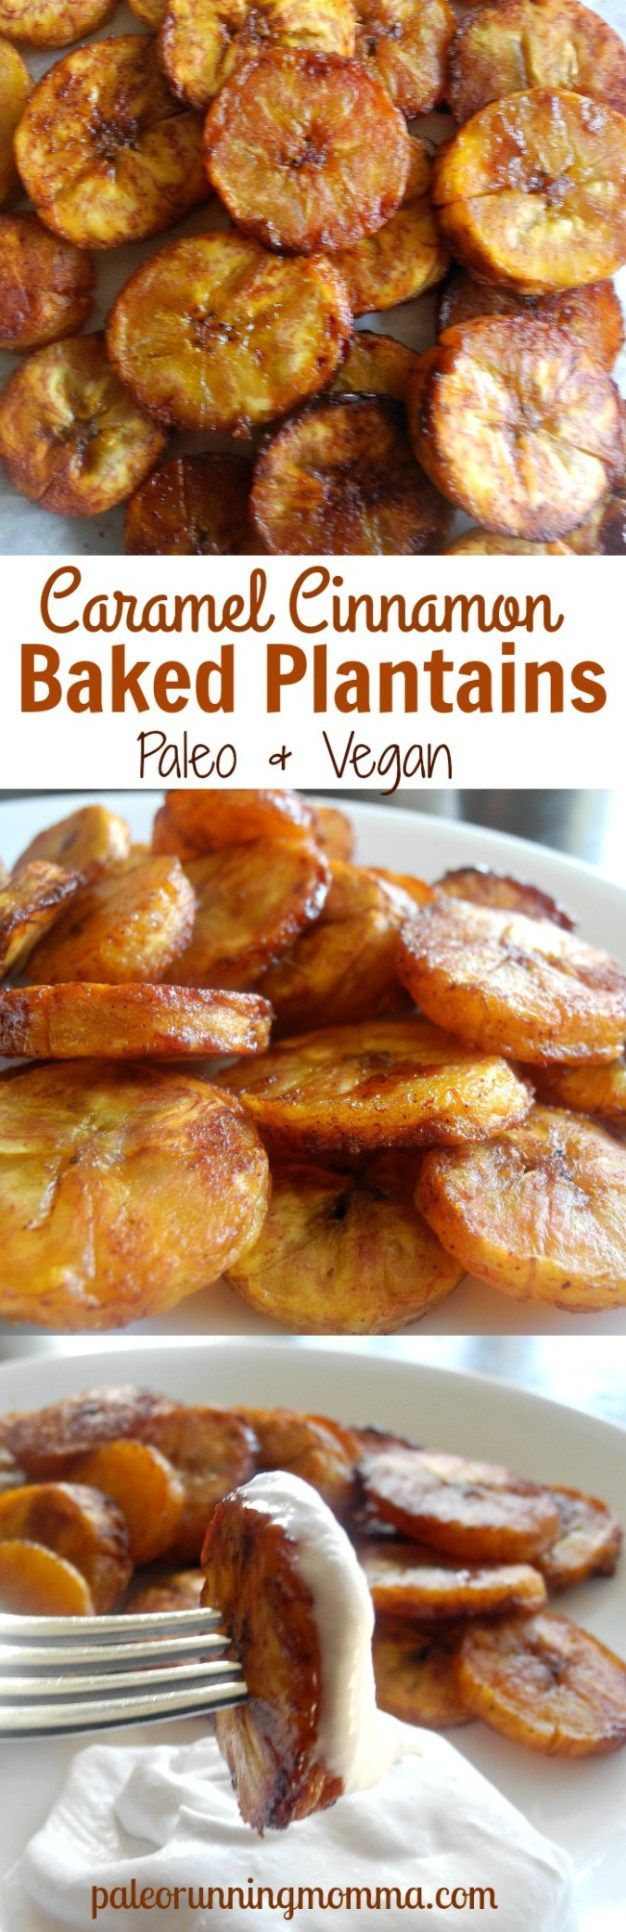 Caramel Cinnamon Baked Plantains (paleo & vegan & grain free) @paleorunmomma